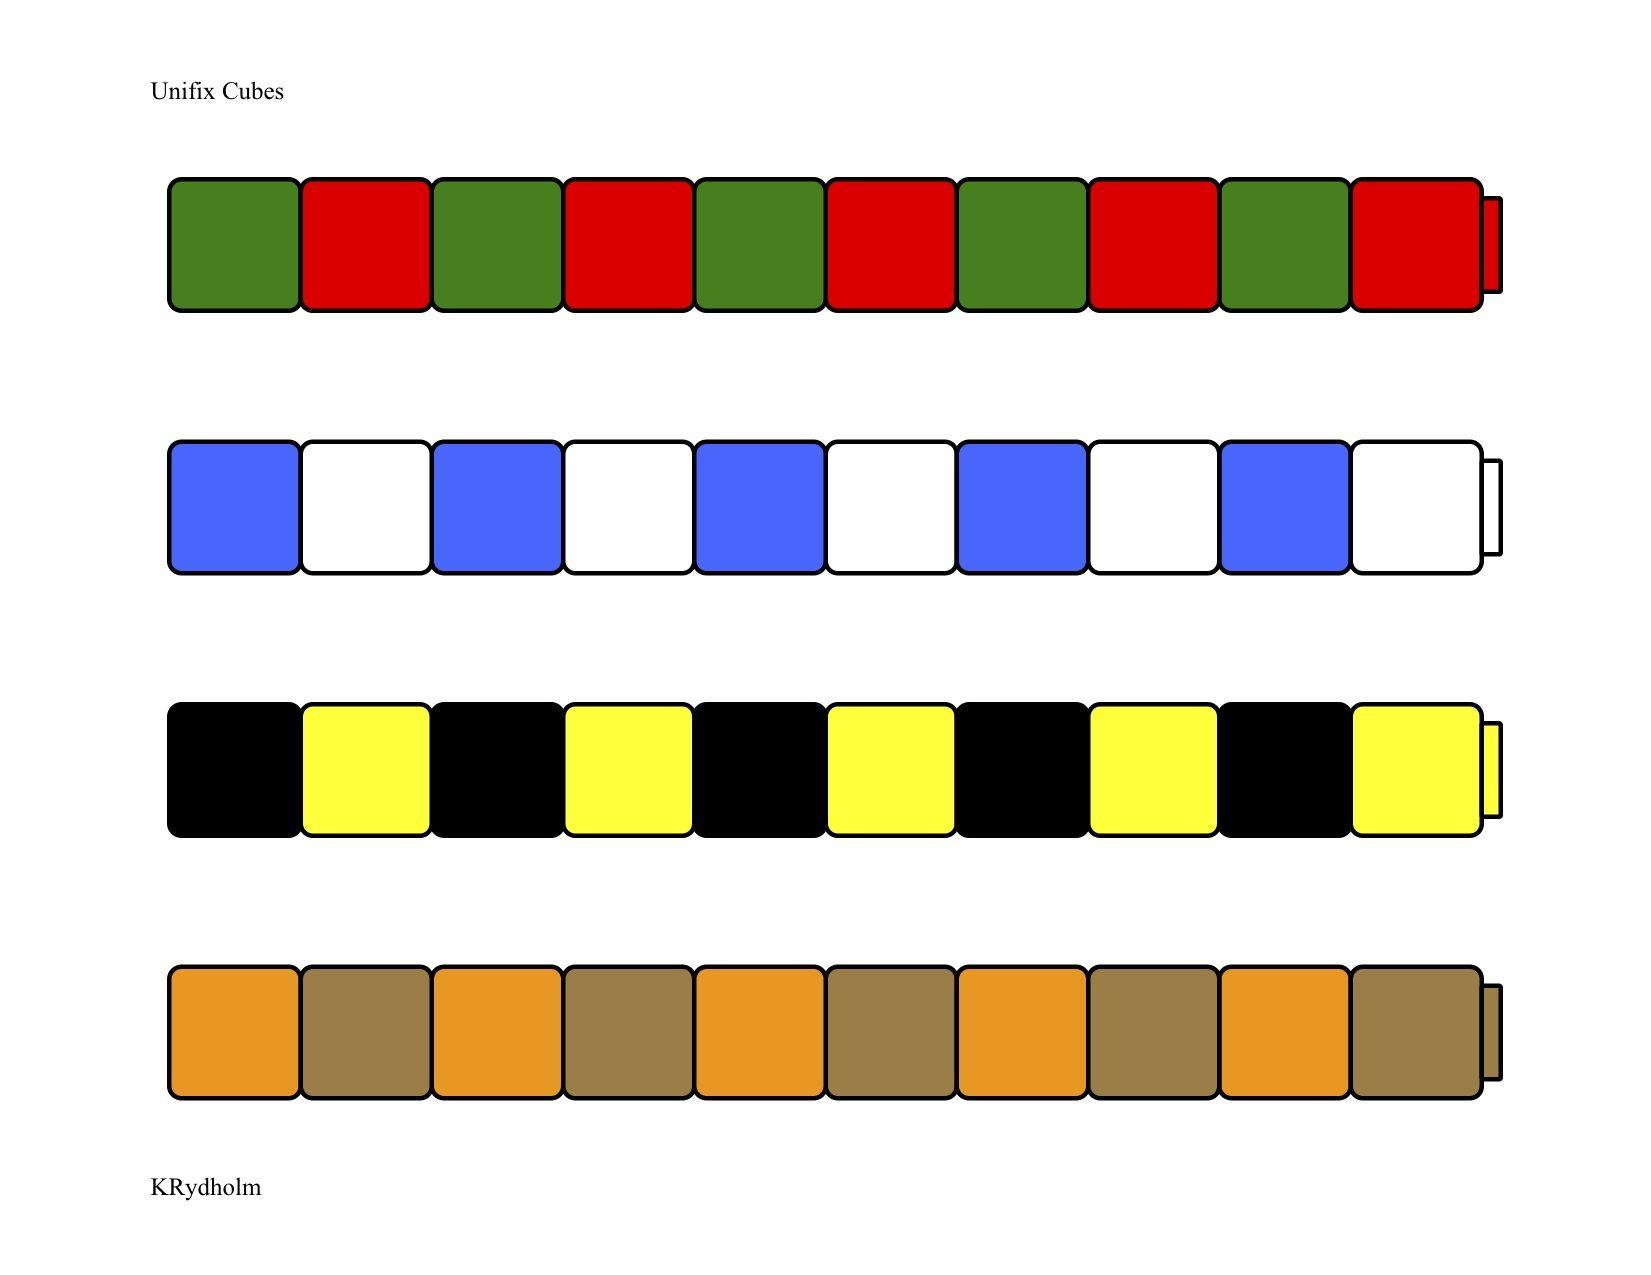 Unifix Patterns 1